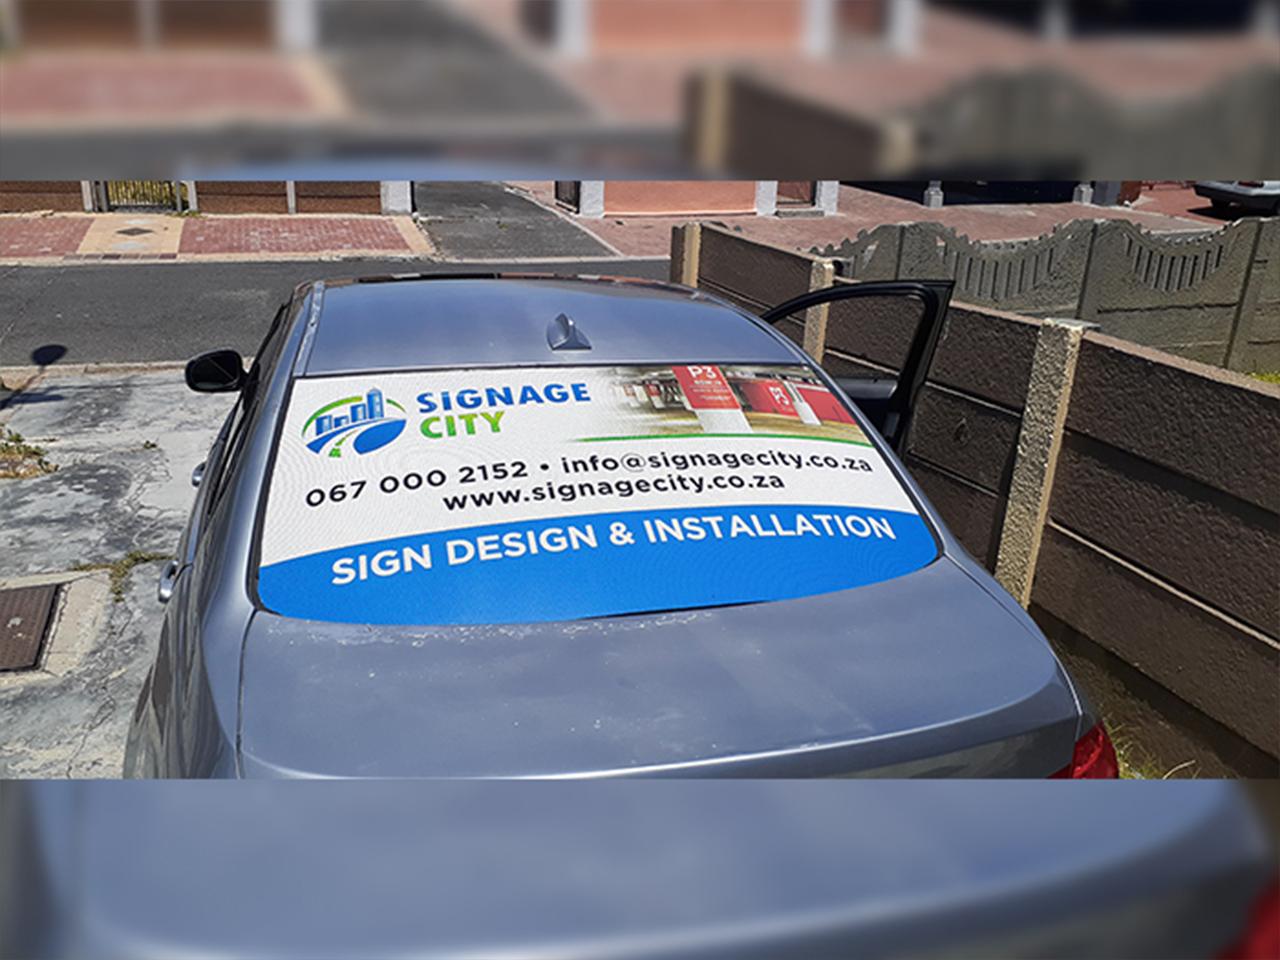 Signage City Vehicle Branding